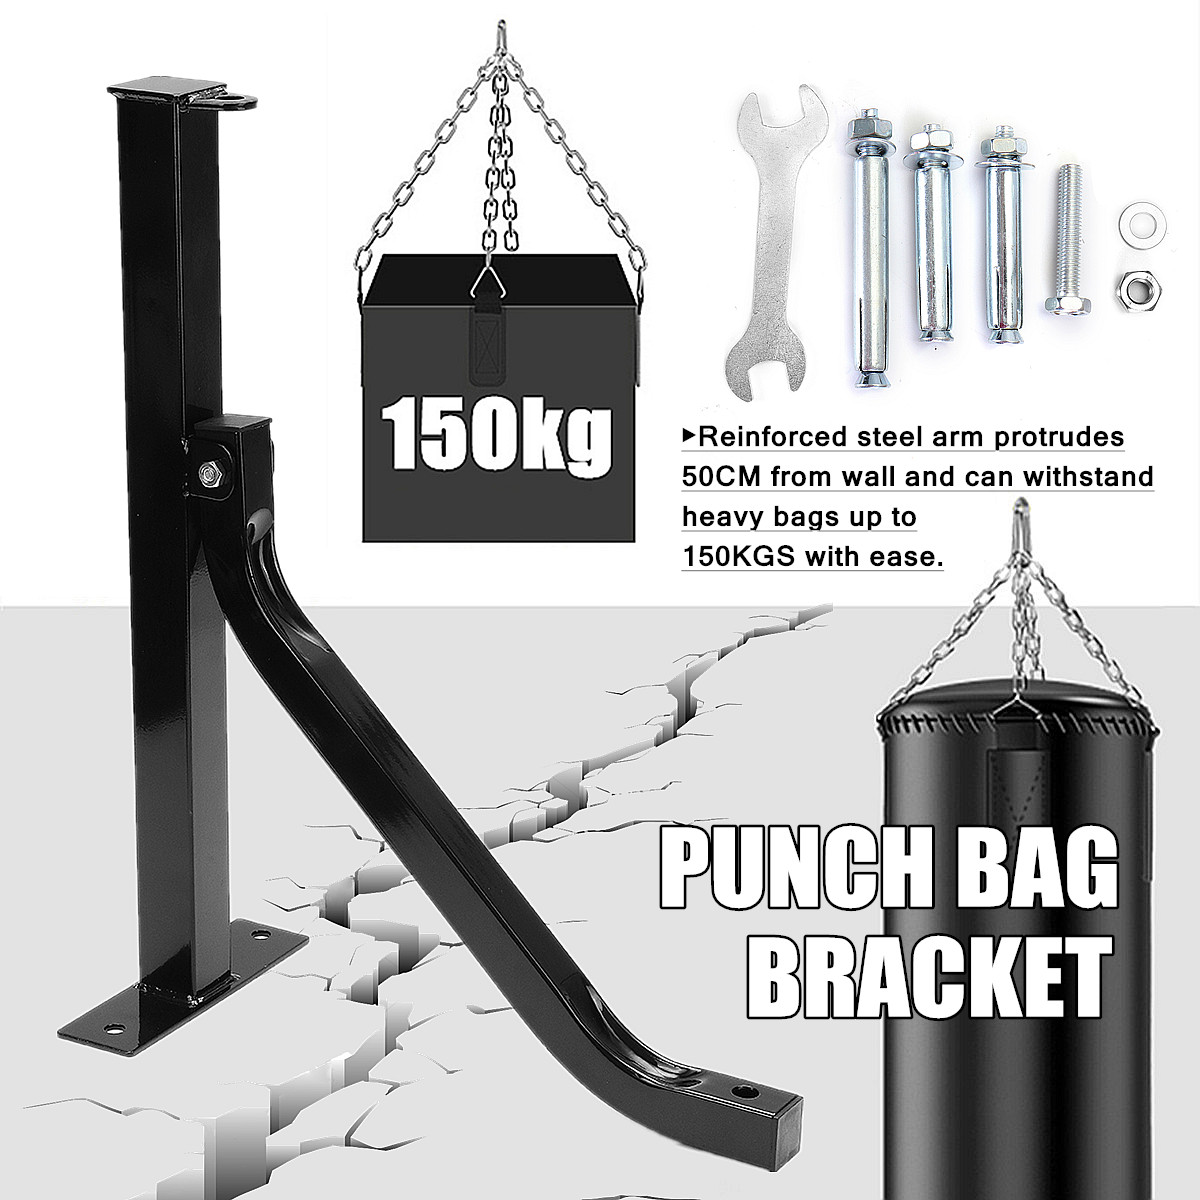 Heavy Duty Steel Boxing Punch Bag Wall Bracket Mount Hanging Stand Holder Hanger Three Bolt Points 50x15x5cm Maximum Load 150kg цена